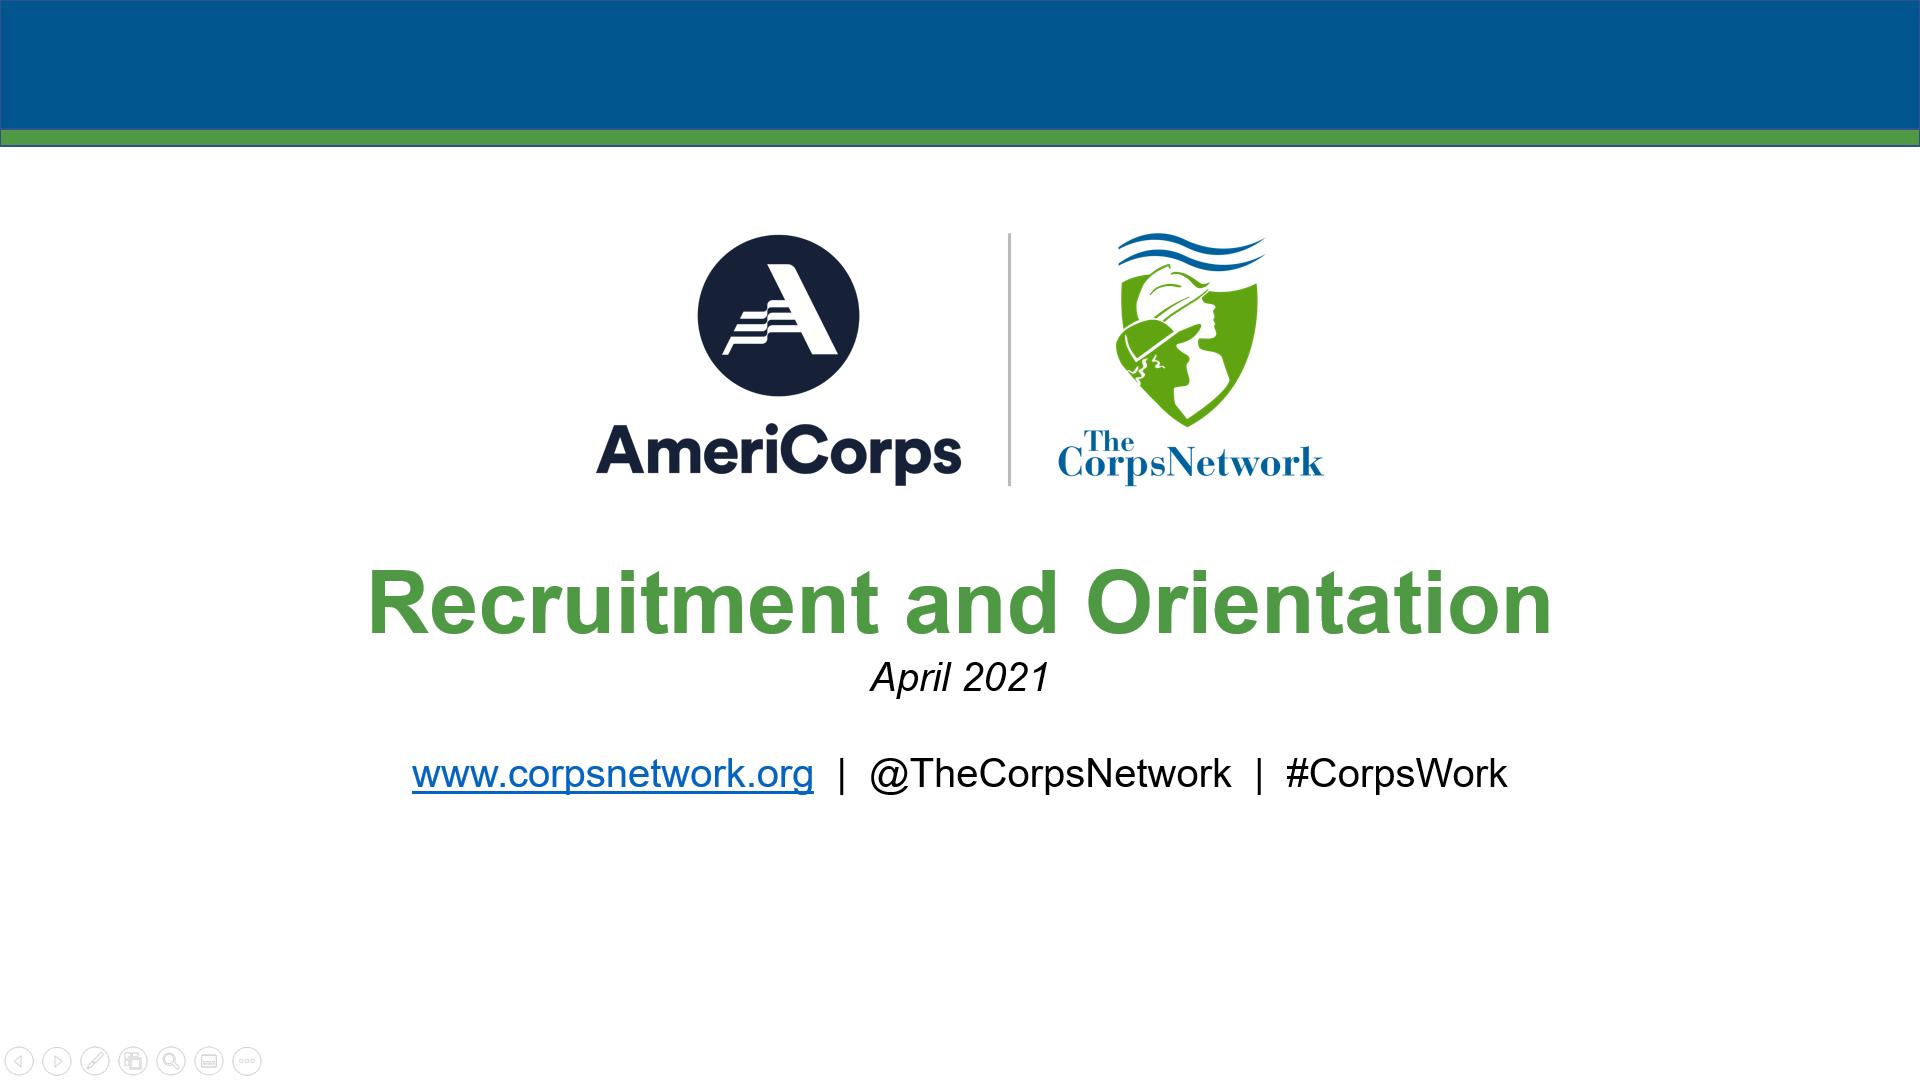 Recruitment and Orientation